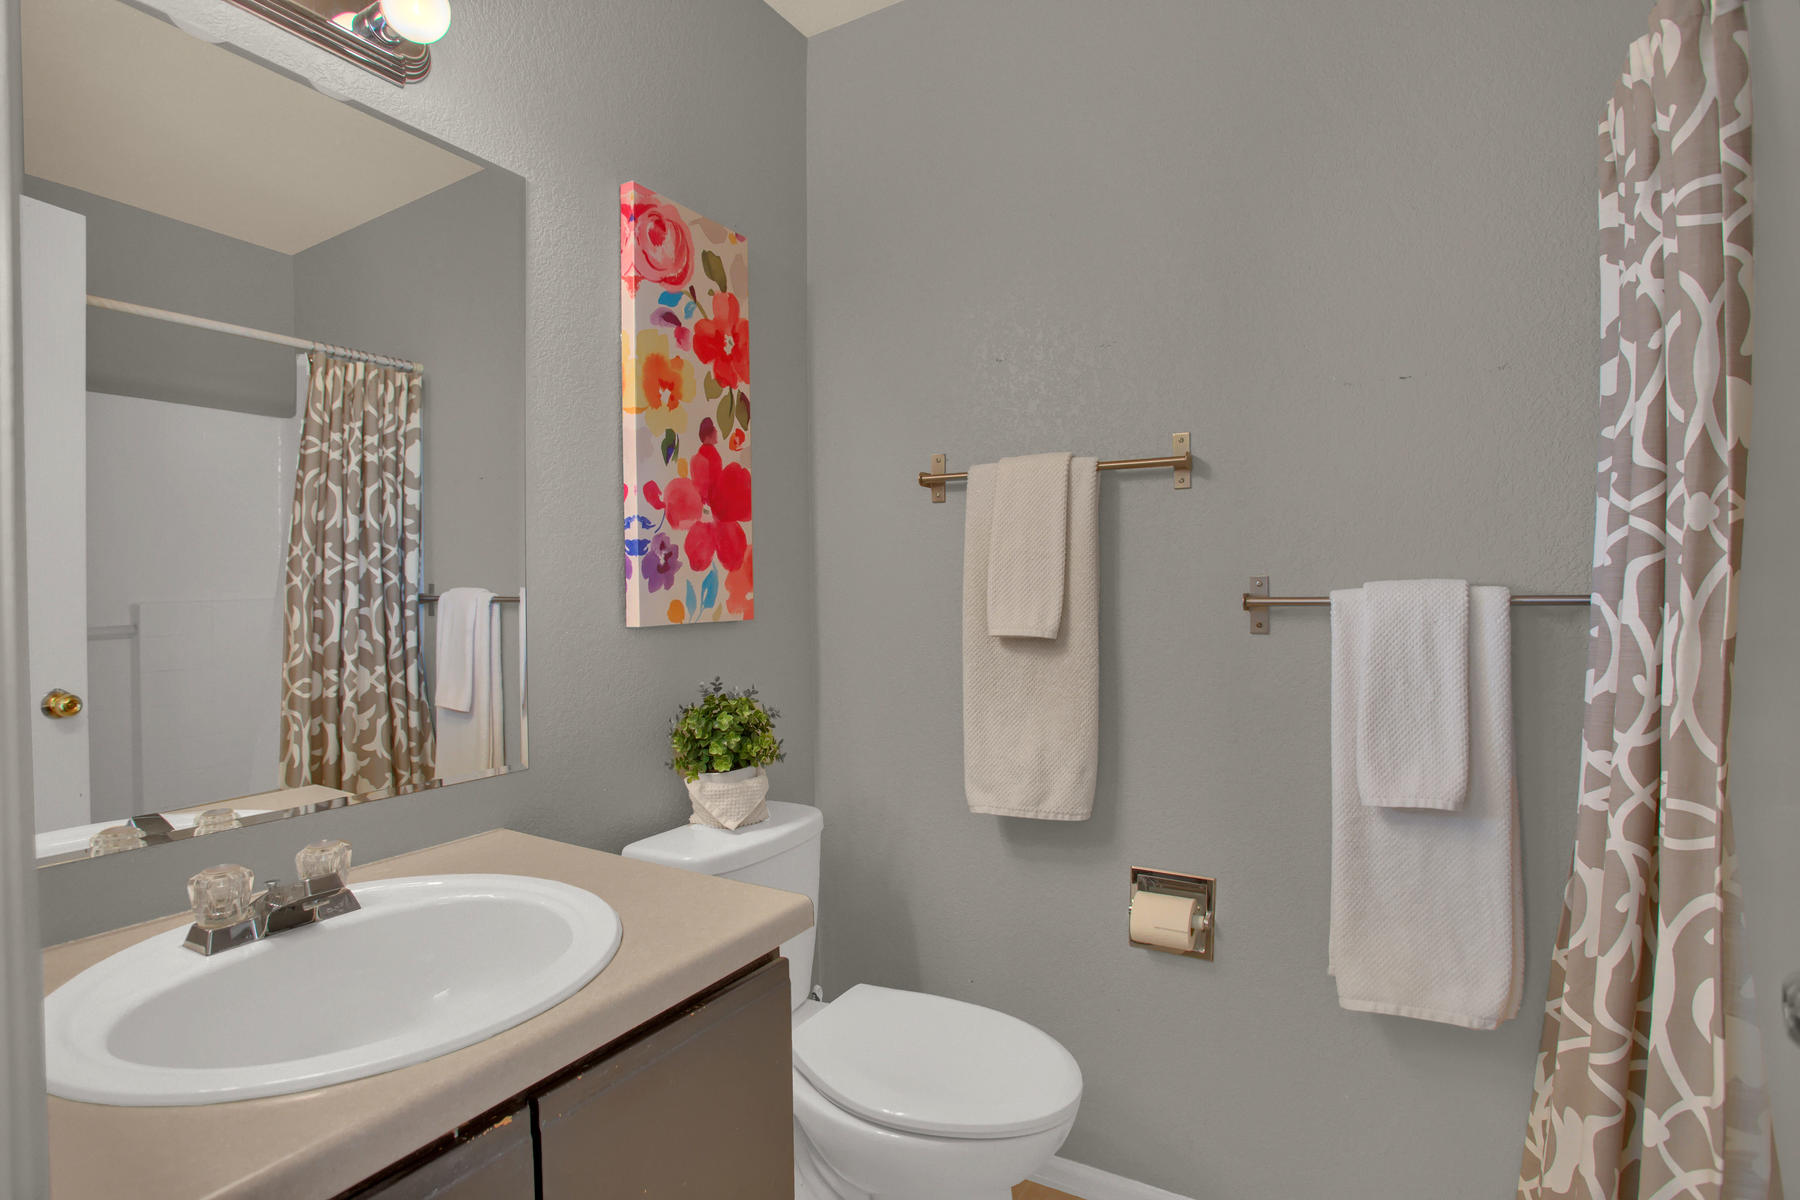 11662 Oakland Dr Commerce City-019-19-Bathroom-MLS_Size.jpg